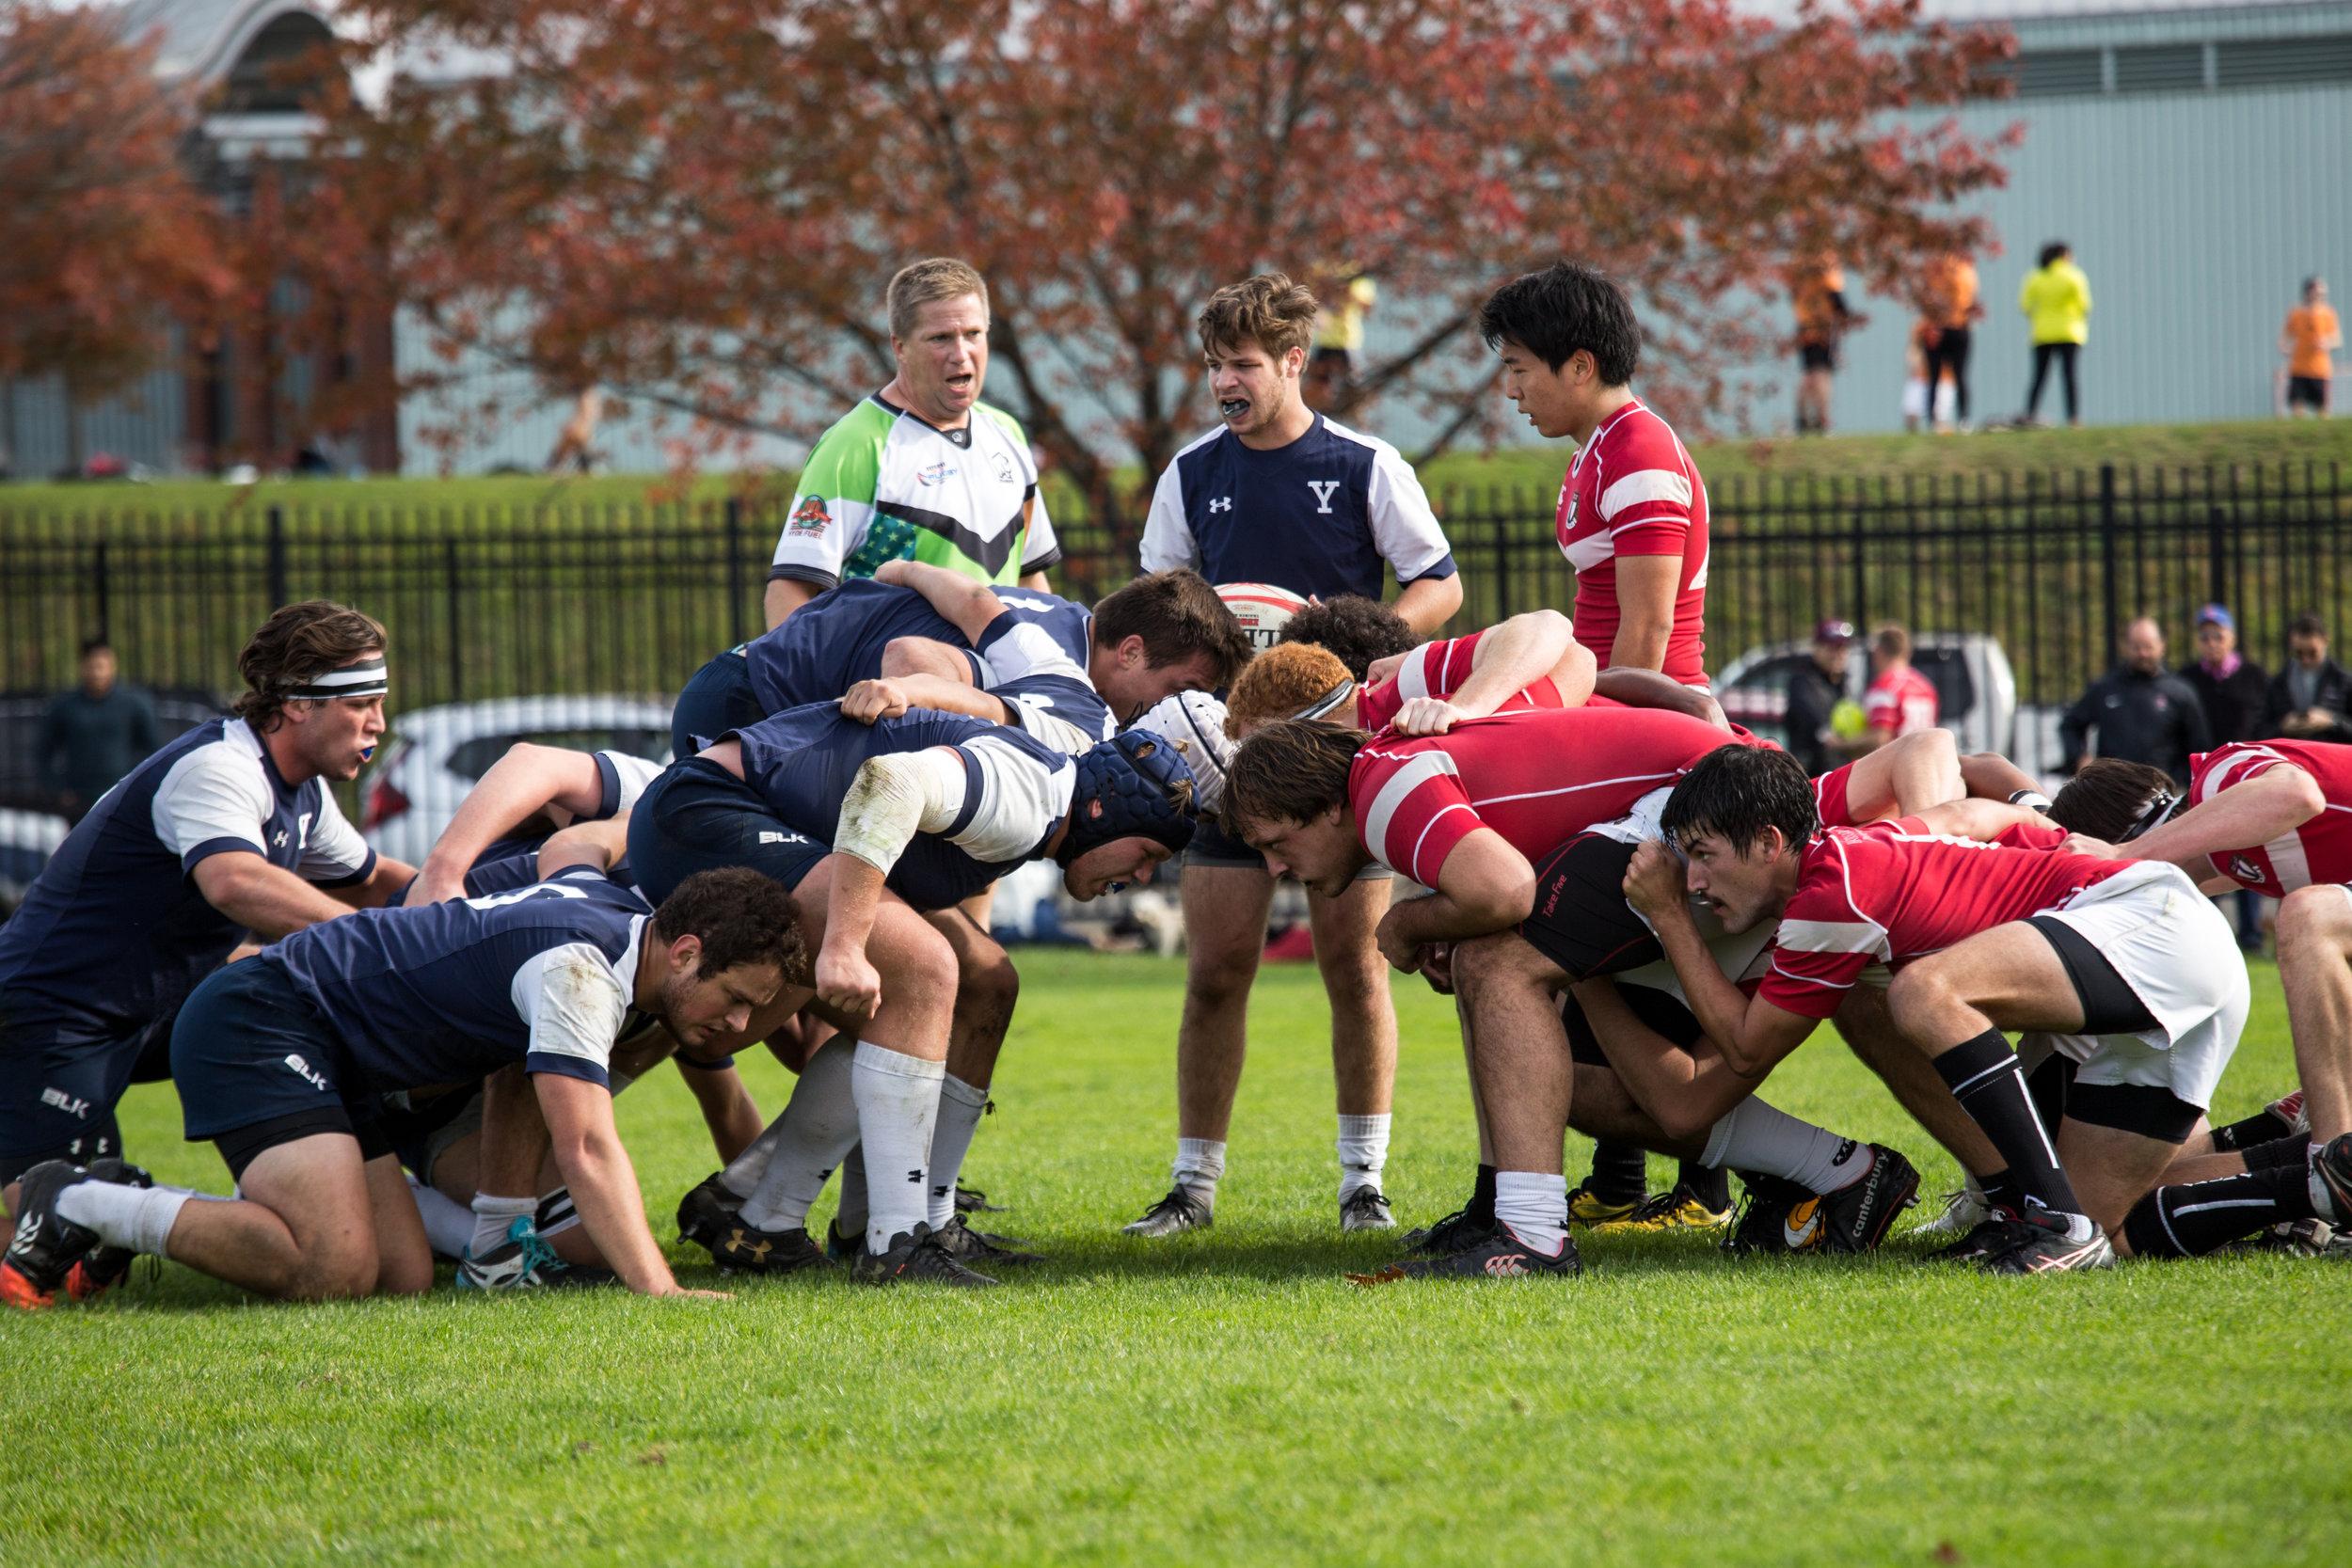 Yale Harvard Ivy League Game-014.jpg